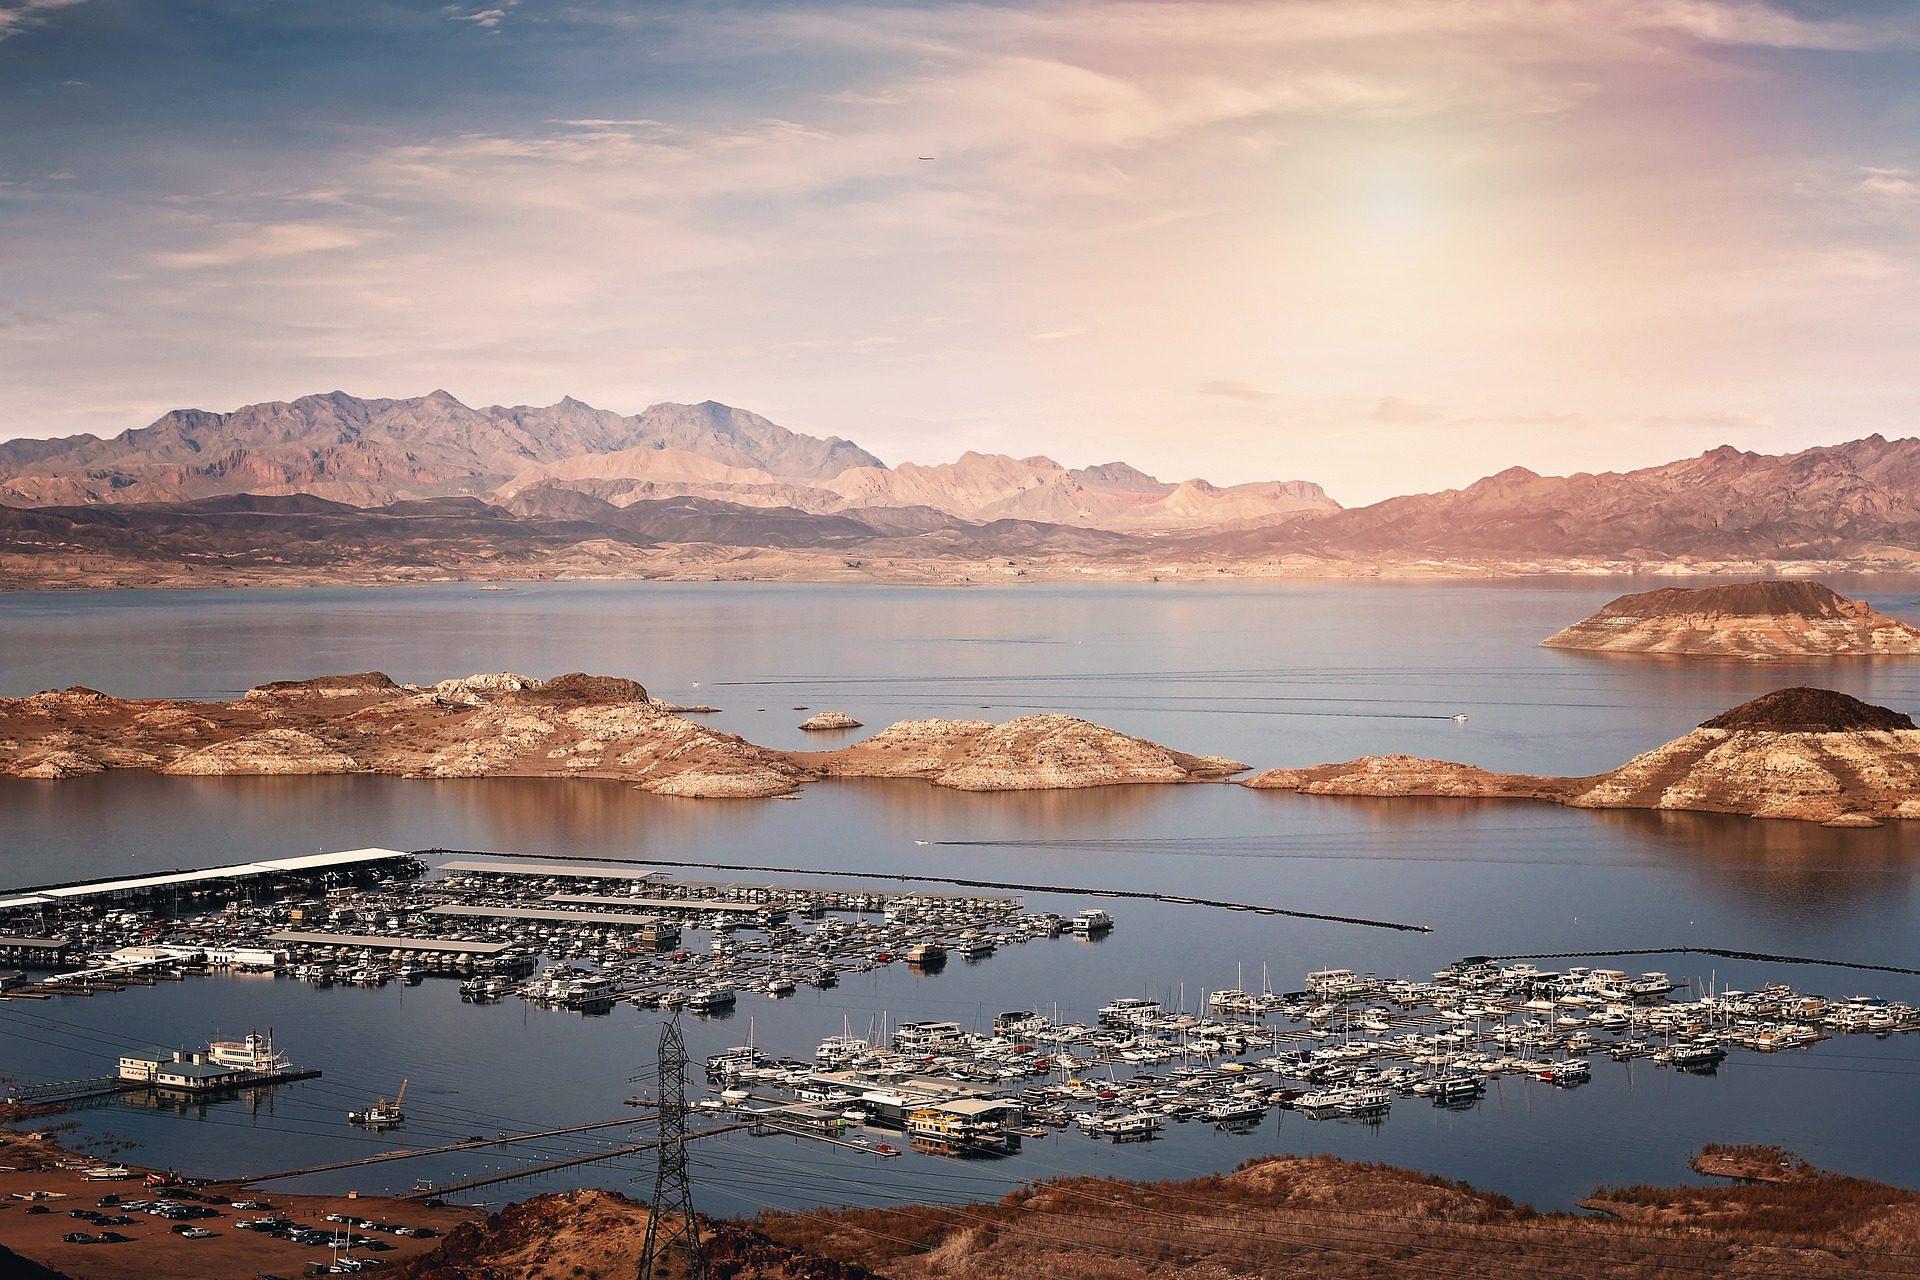 Lake Mead, Southern Nevada